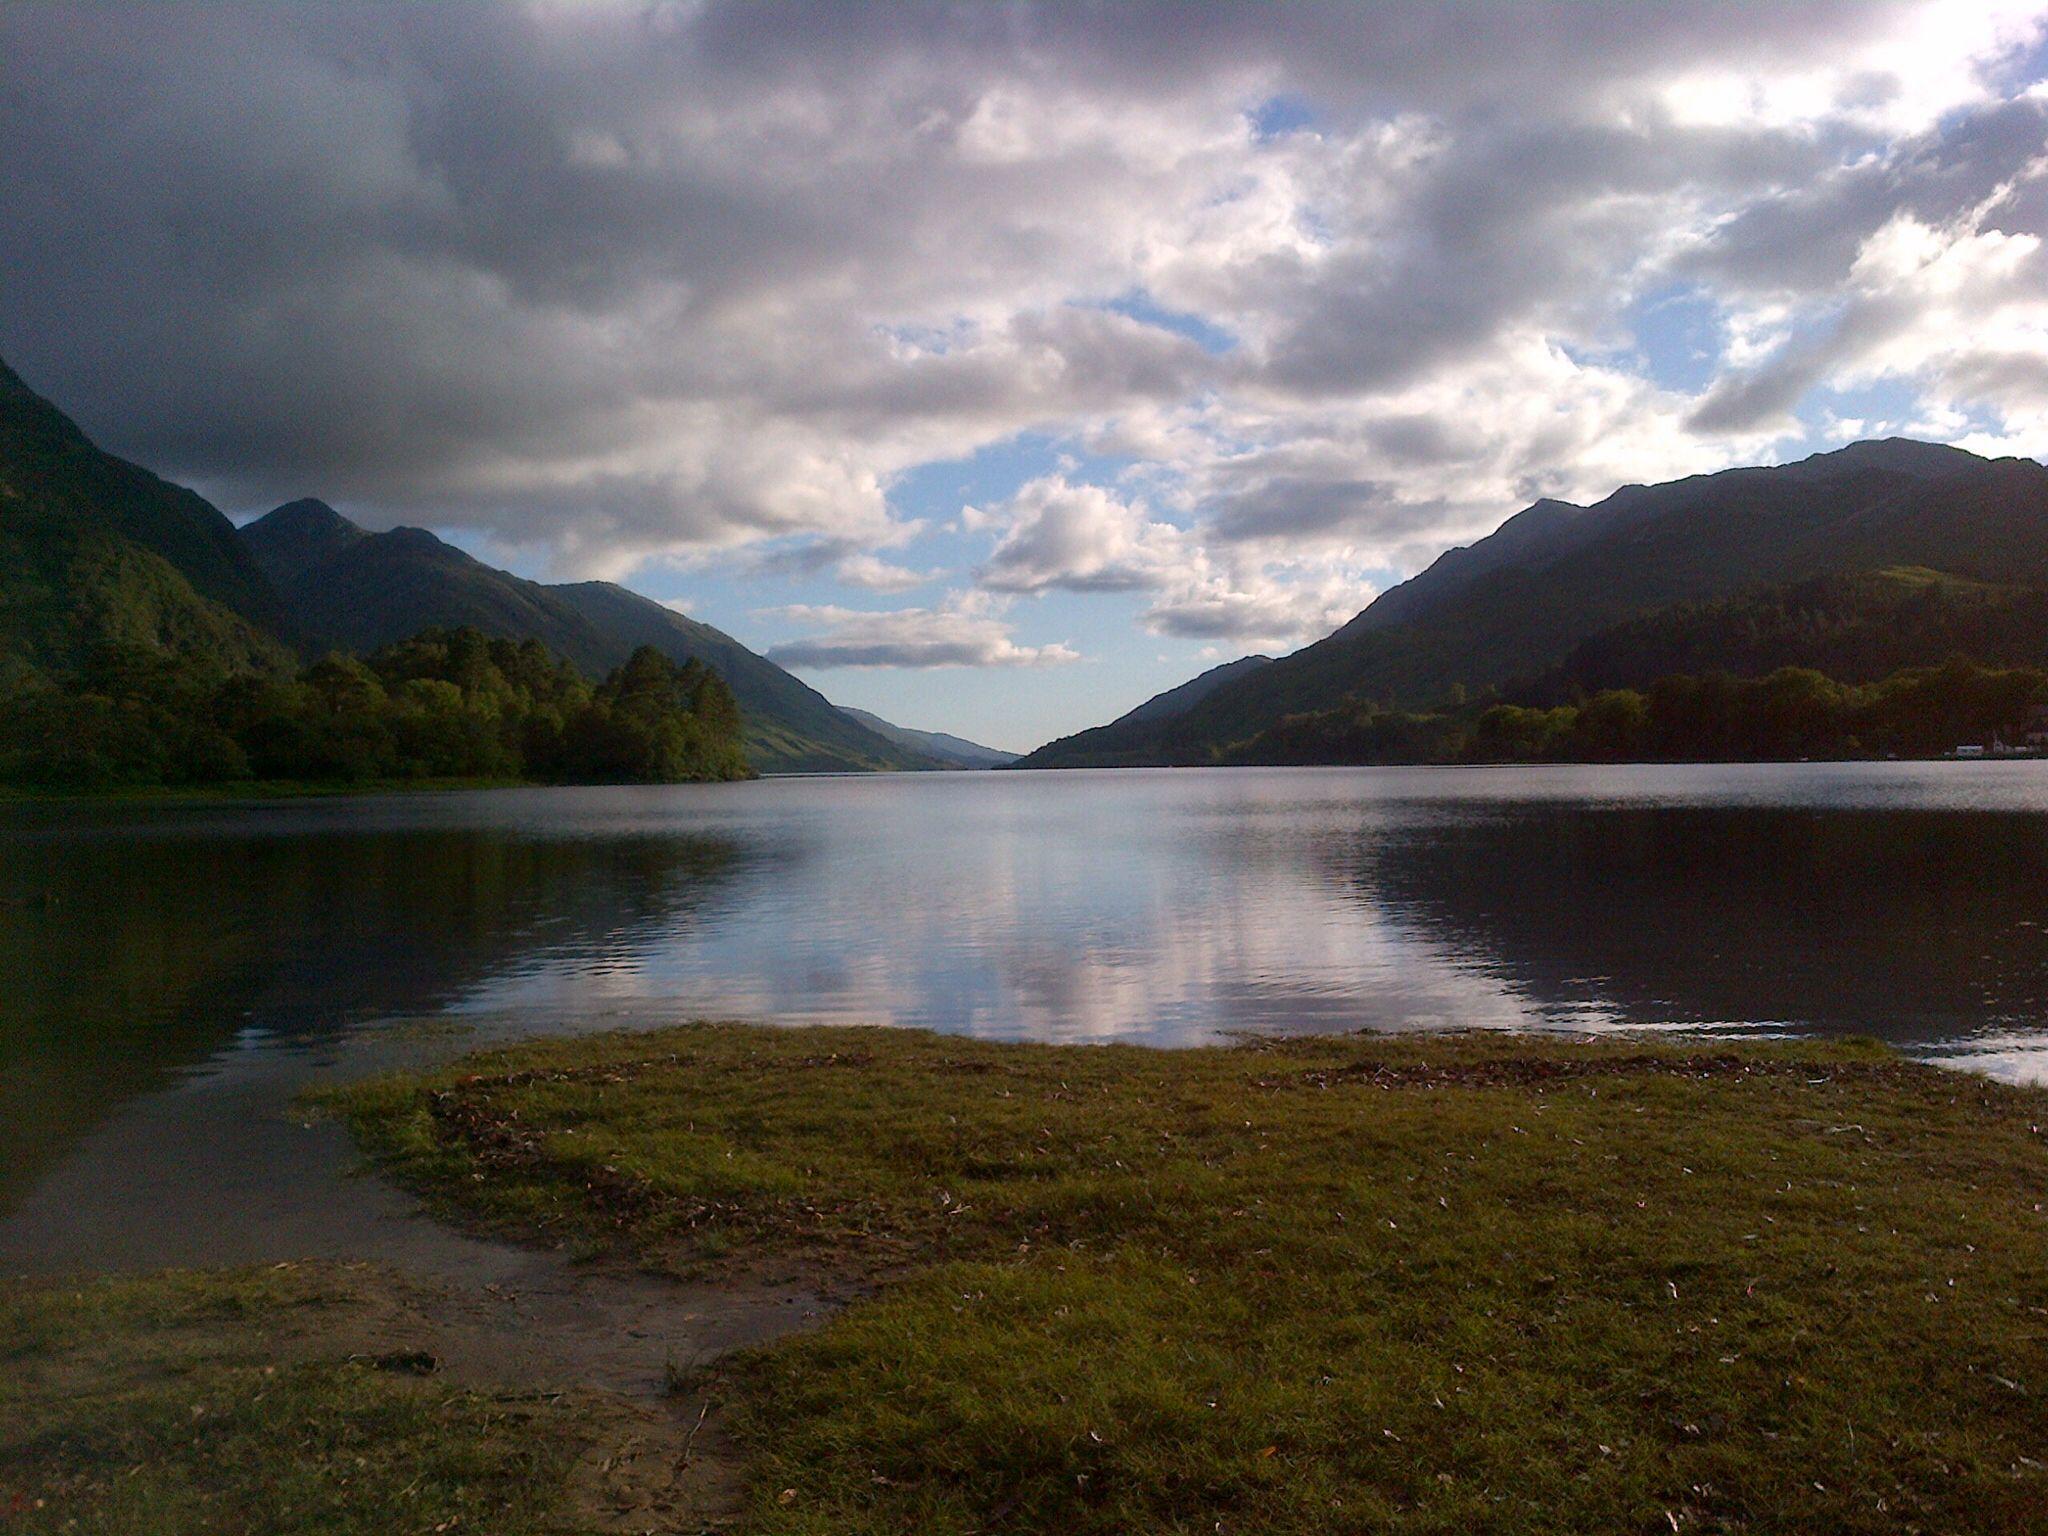 The Black Lake Harry Potter The Goblet Of Fire Loch Shiel Lochaber Natural Landmarks Lake Landmarks